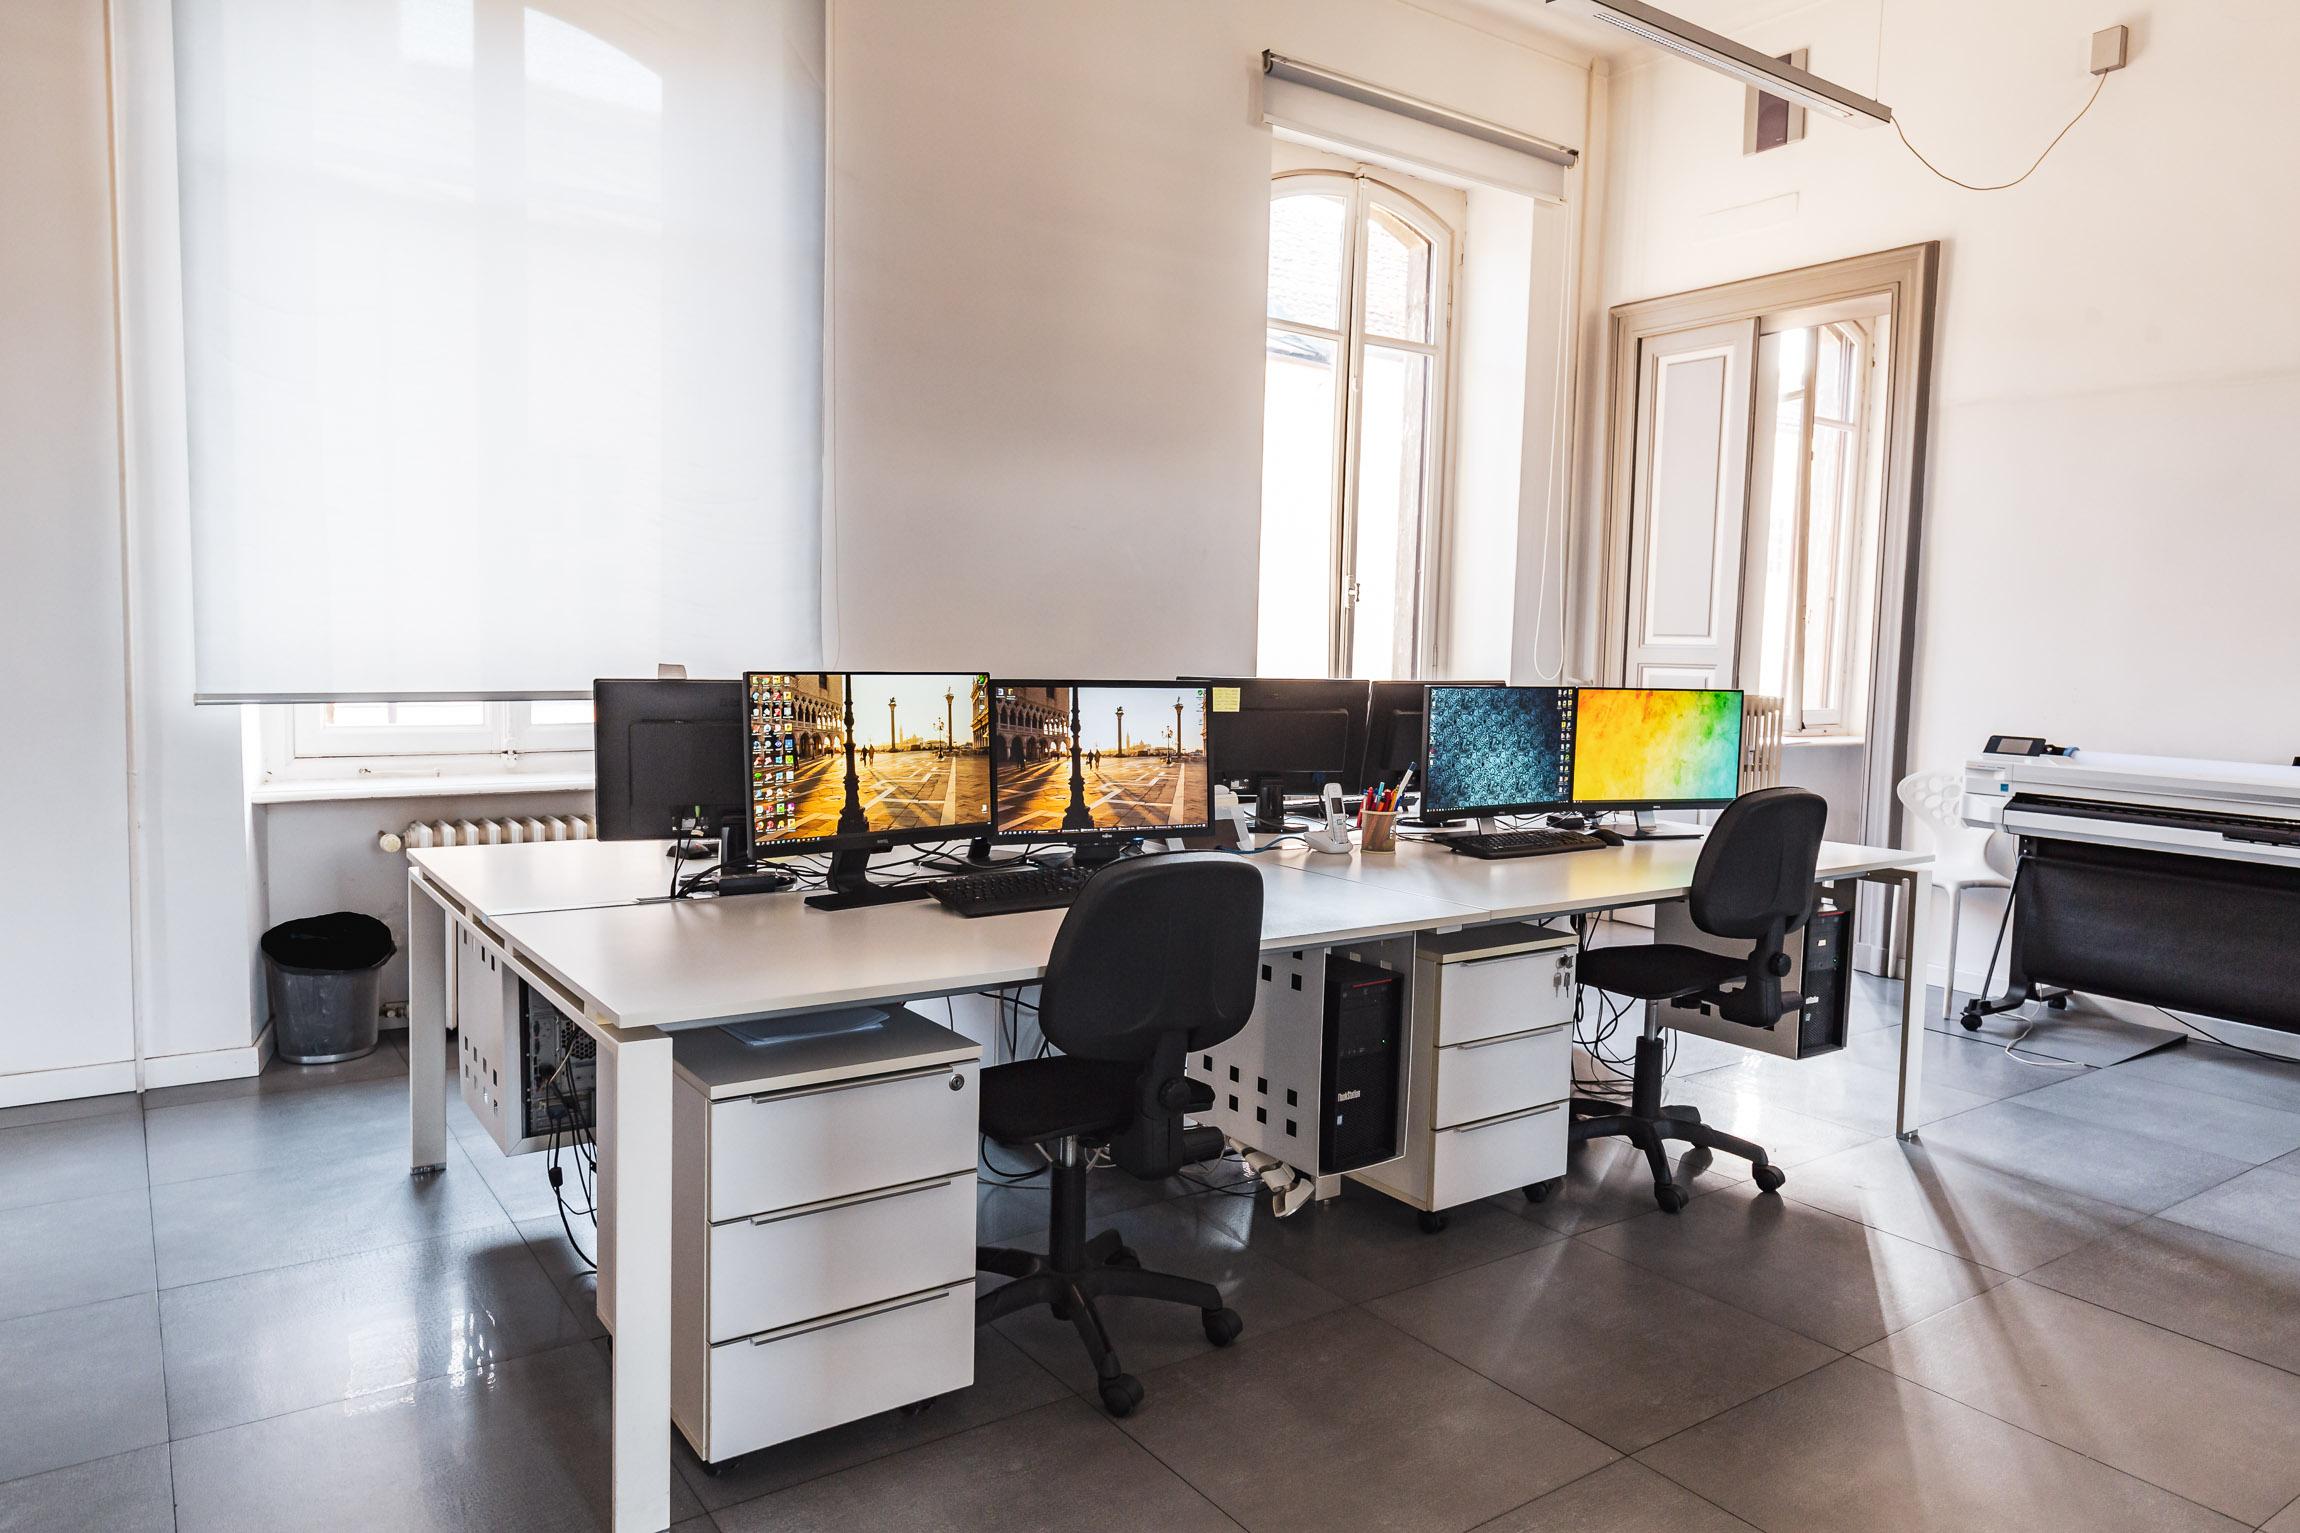 studio bgr architettura